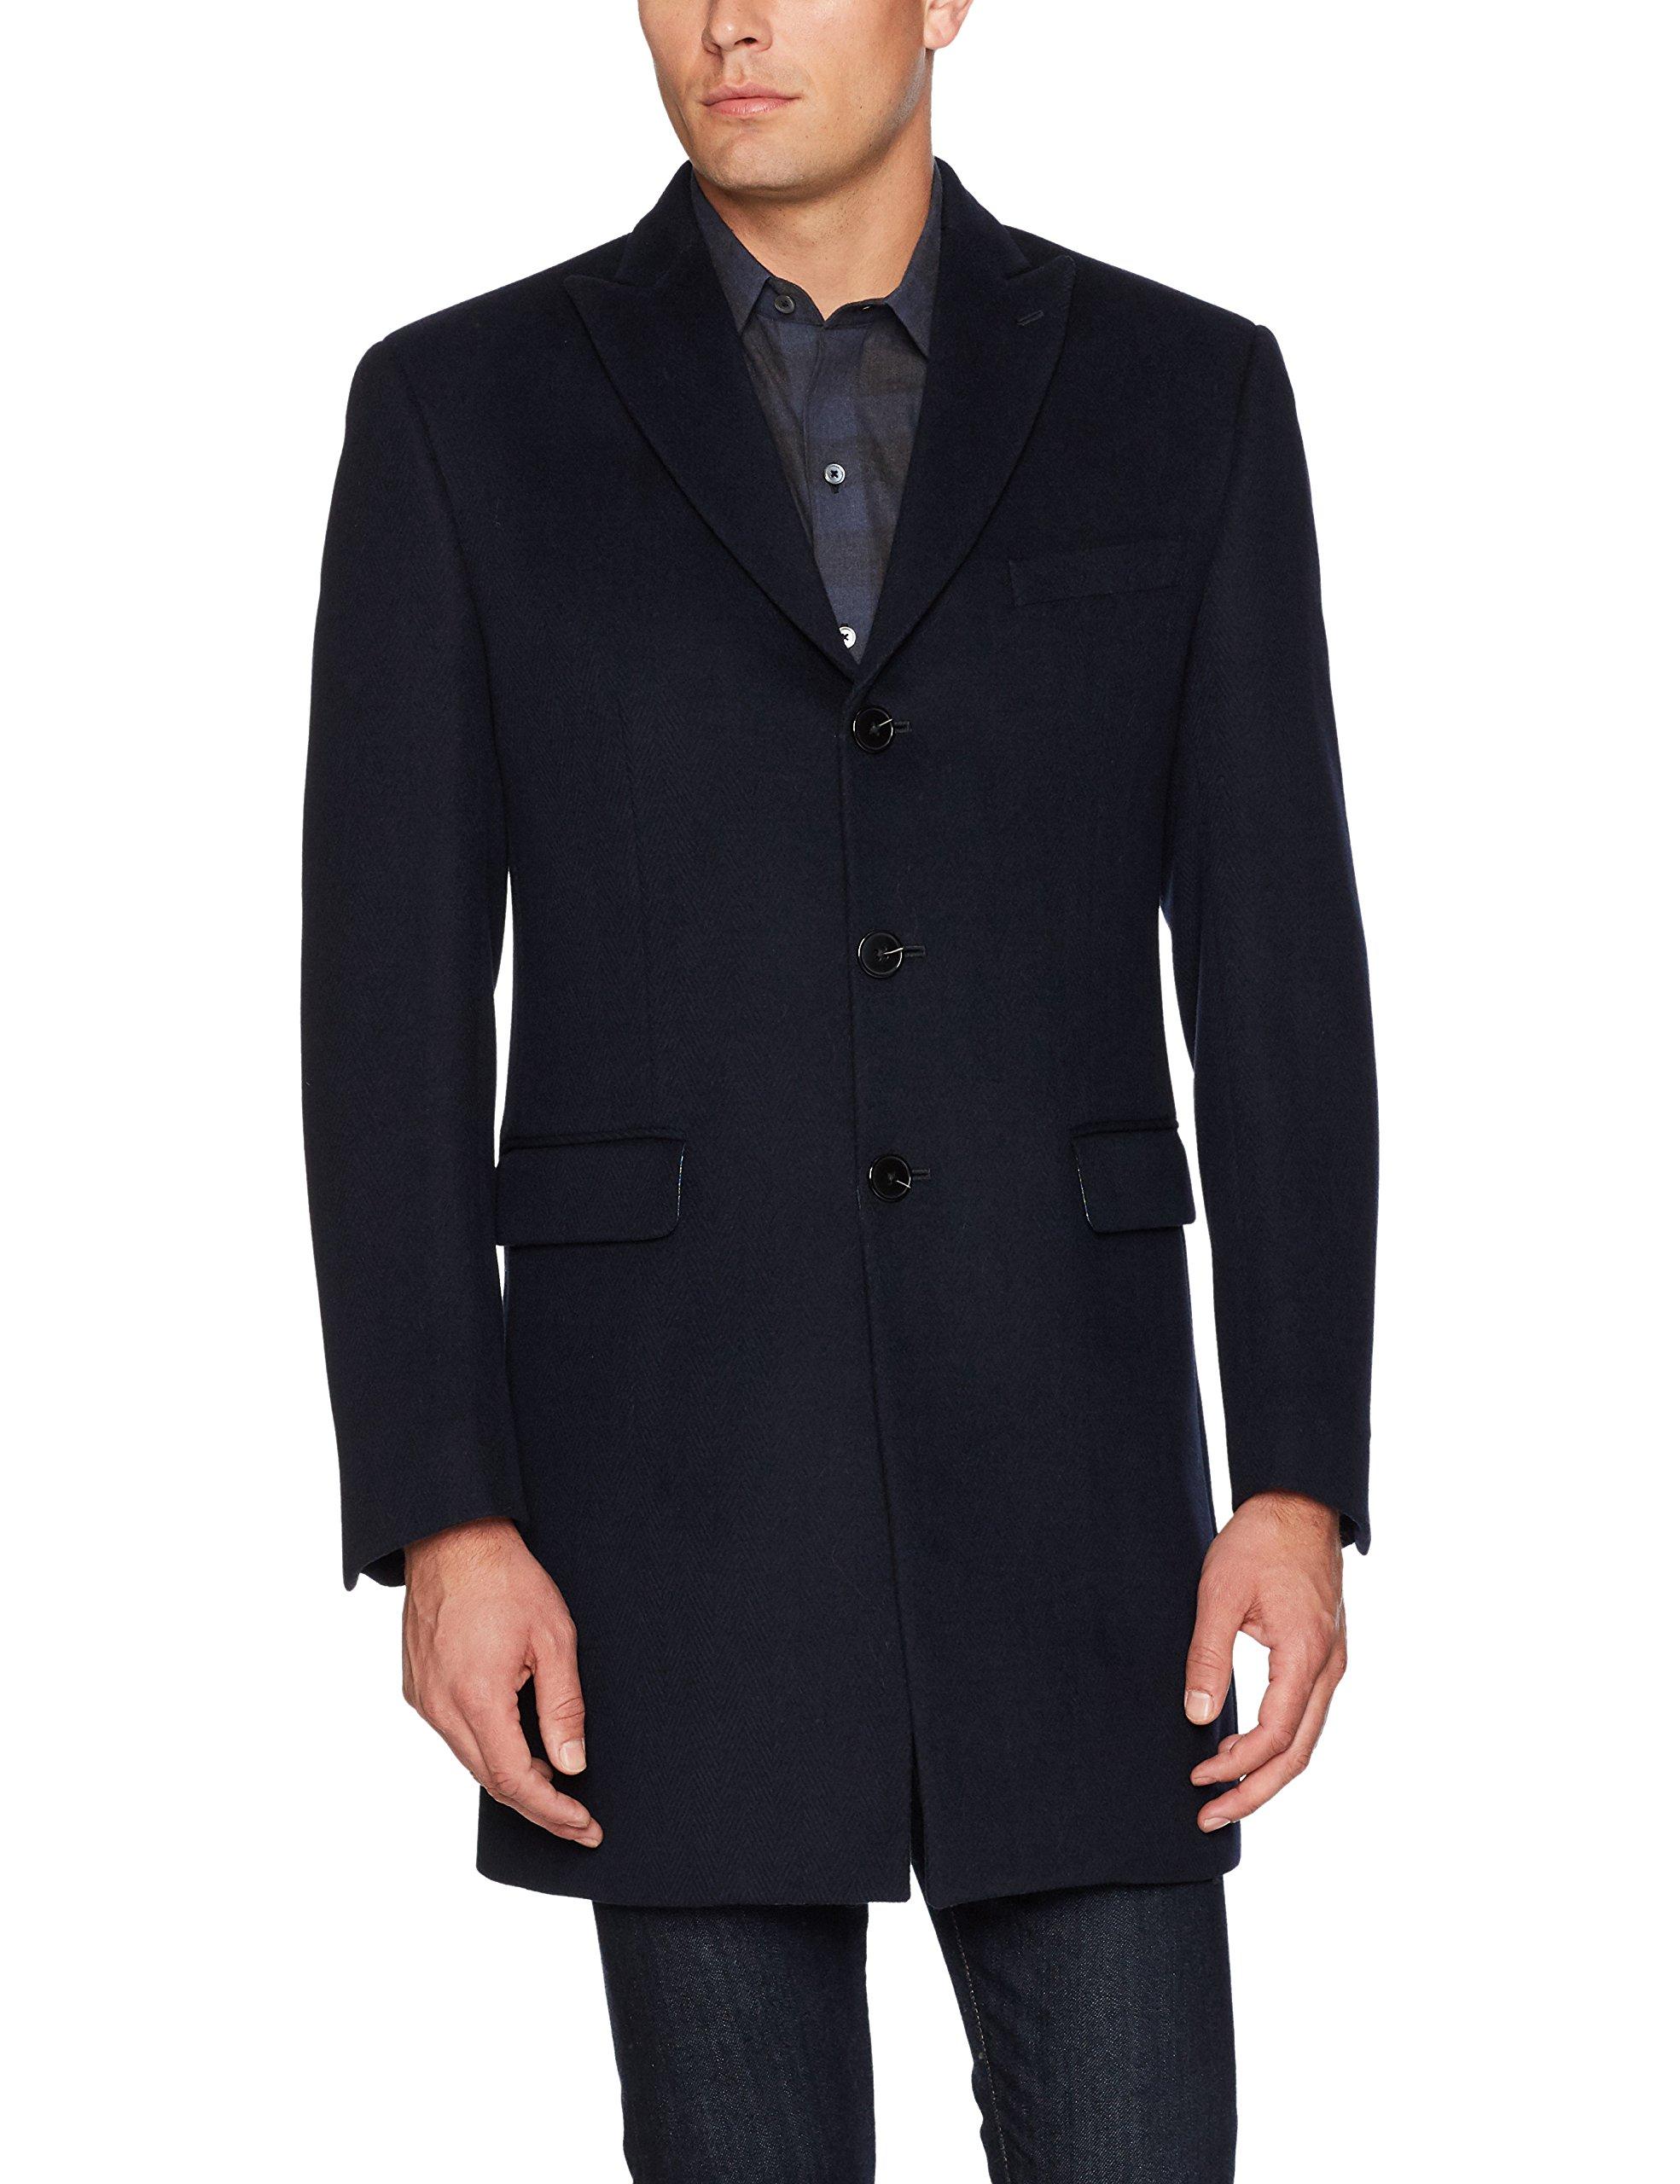 Tallia Men's Versailels Herrring Bone Three Button Peak Lapel Wool Blend Coat, Navy, M by Tallia Orange